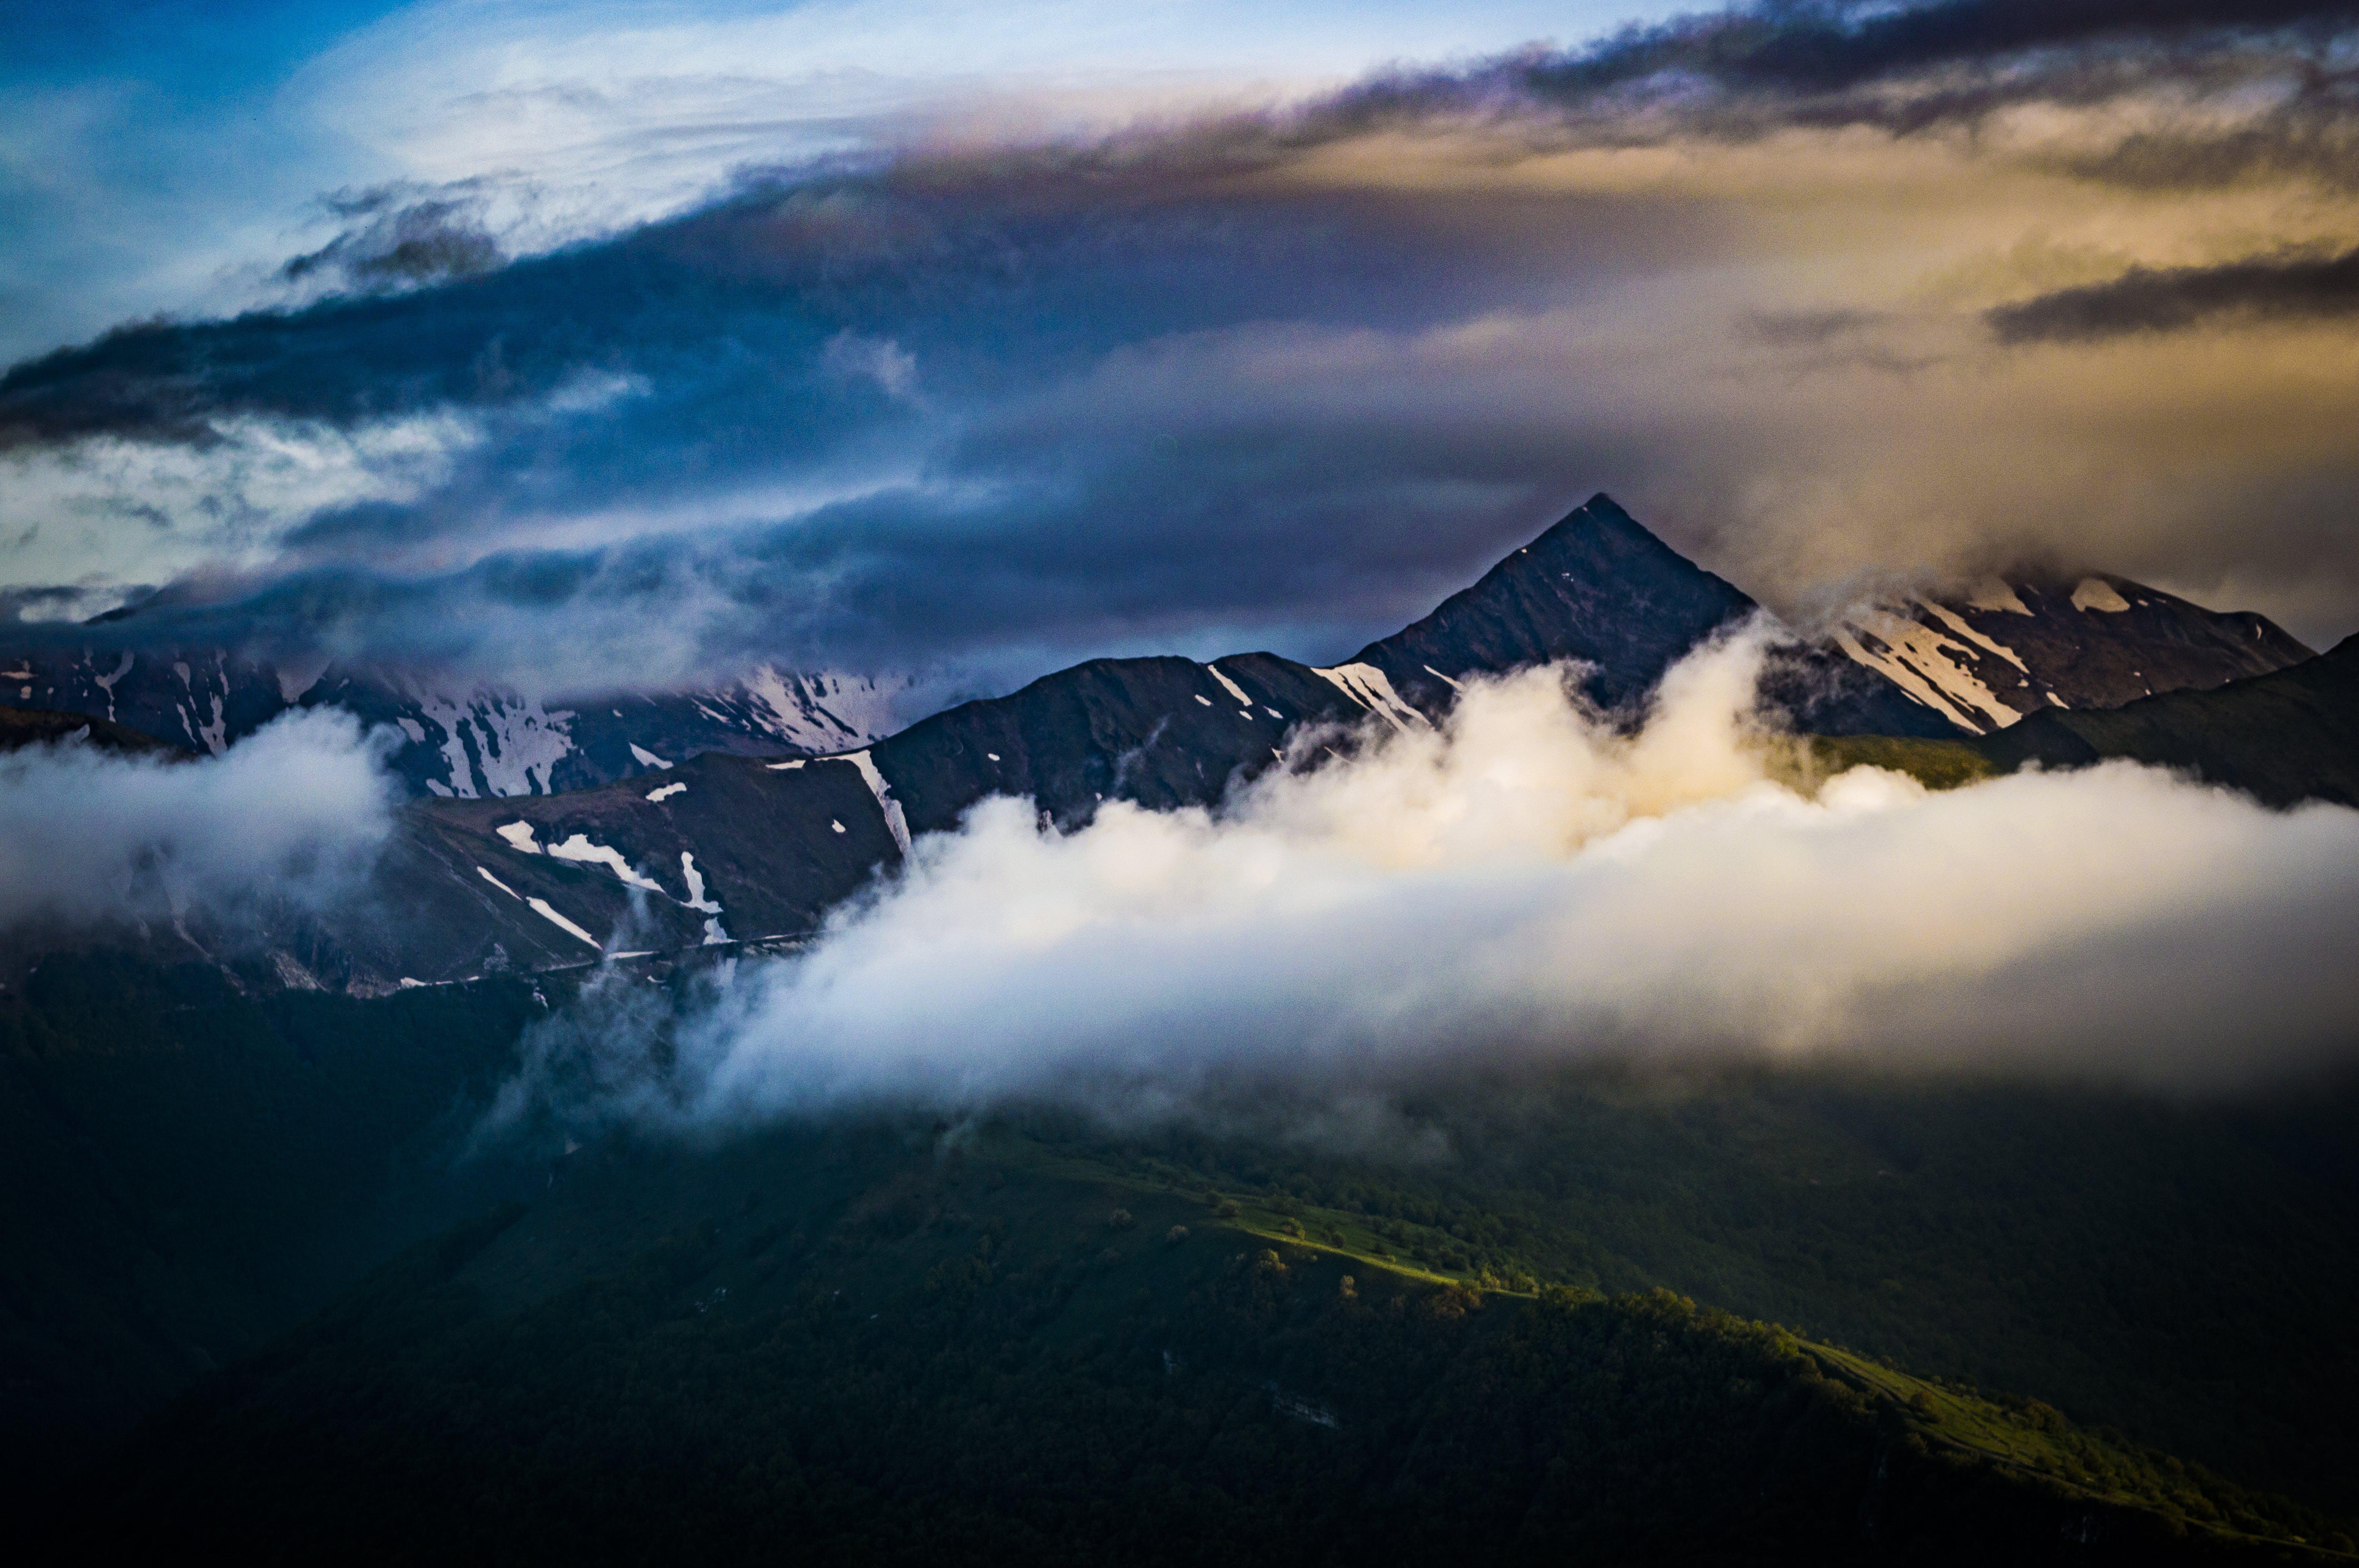 Cumulus Clouds Over Mountain Peak